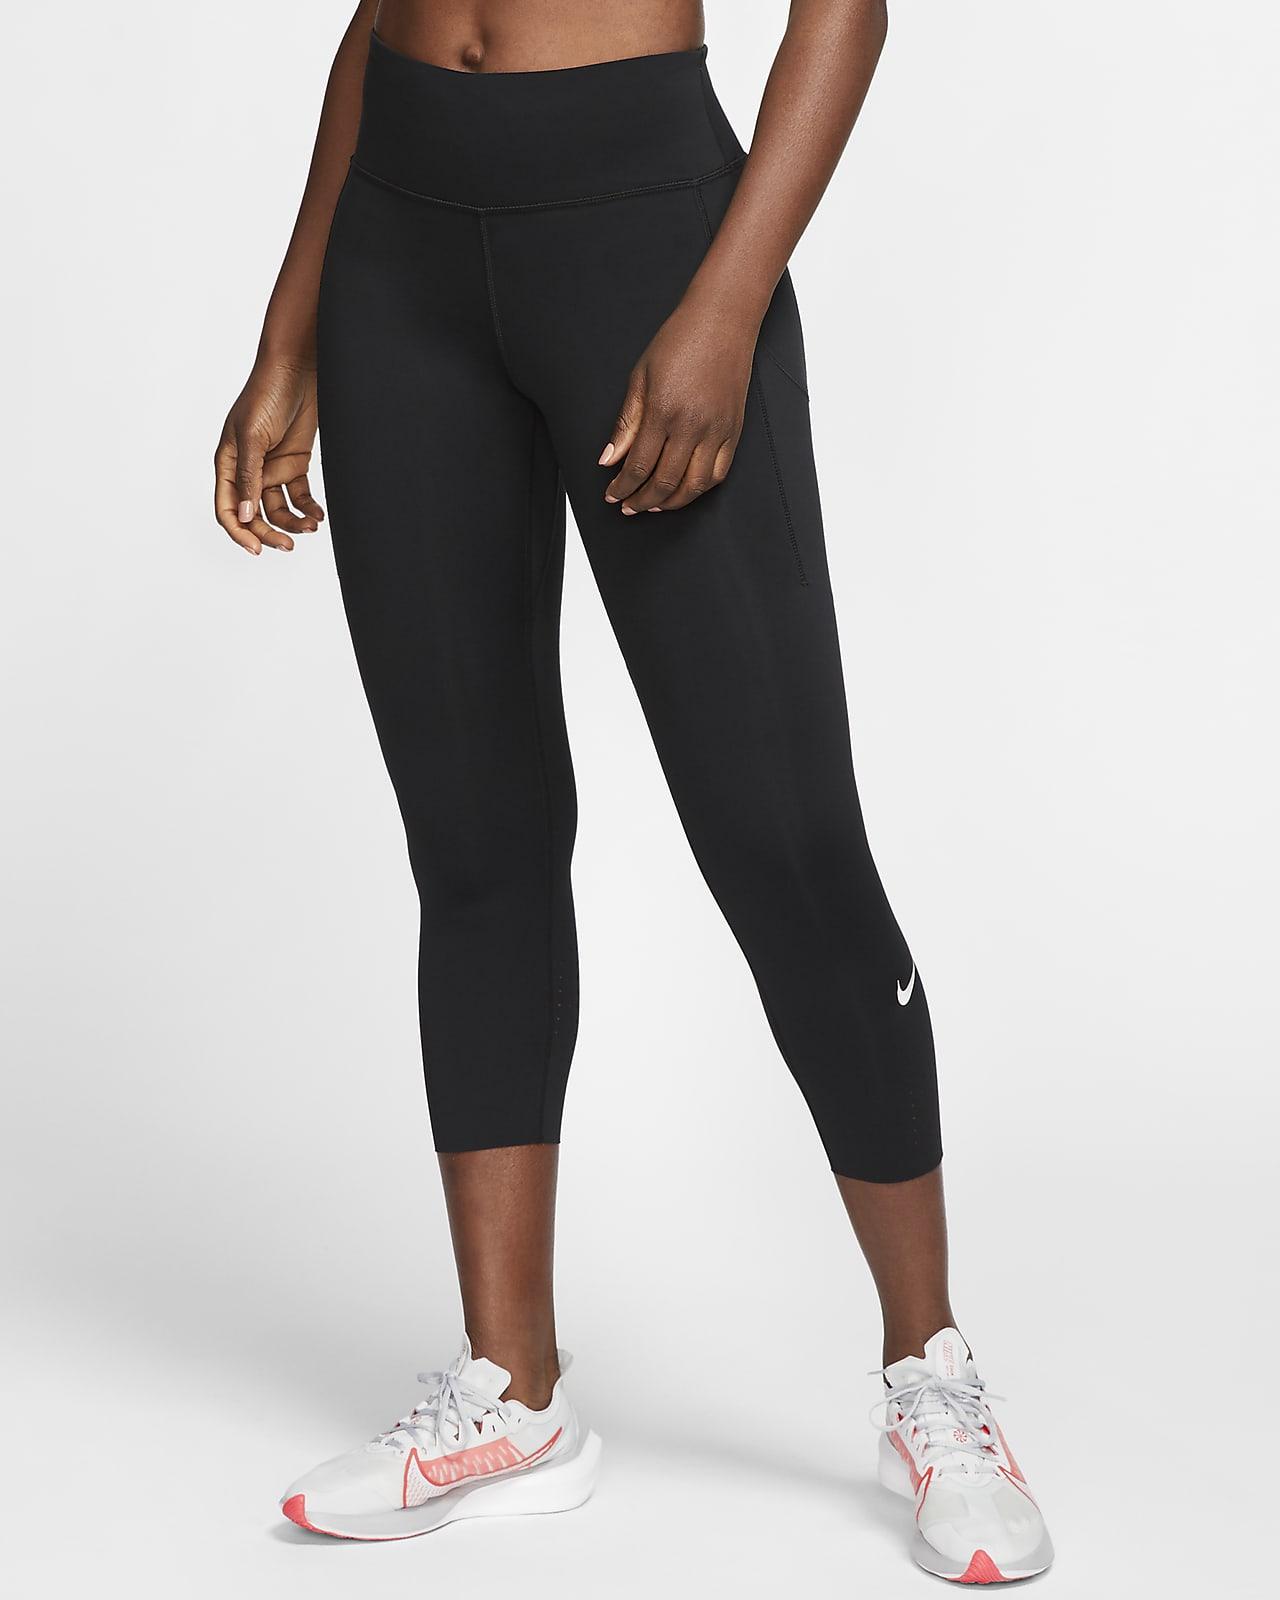 Nike Epic Luxe Women's Running Crop Leggings